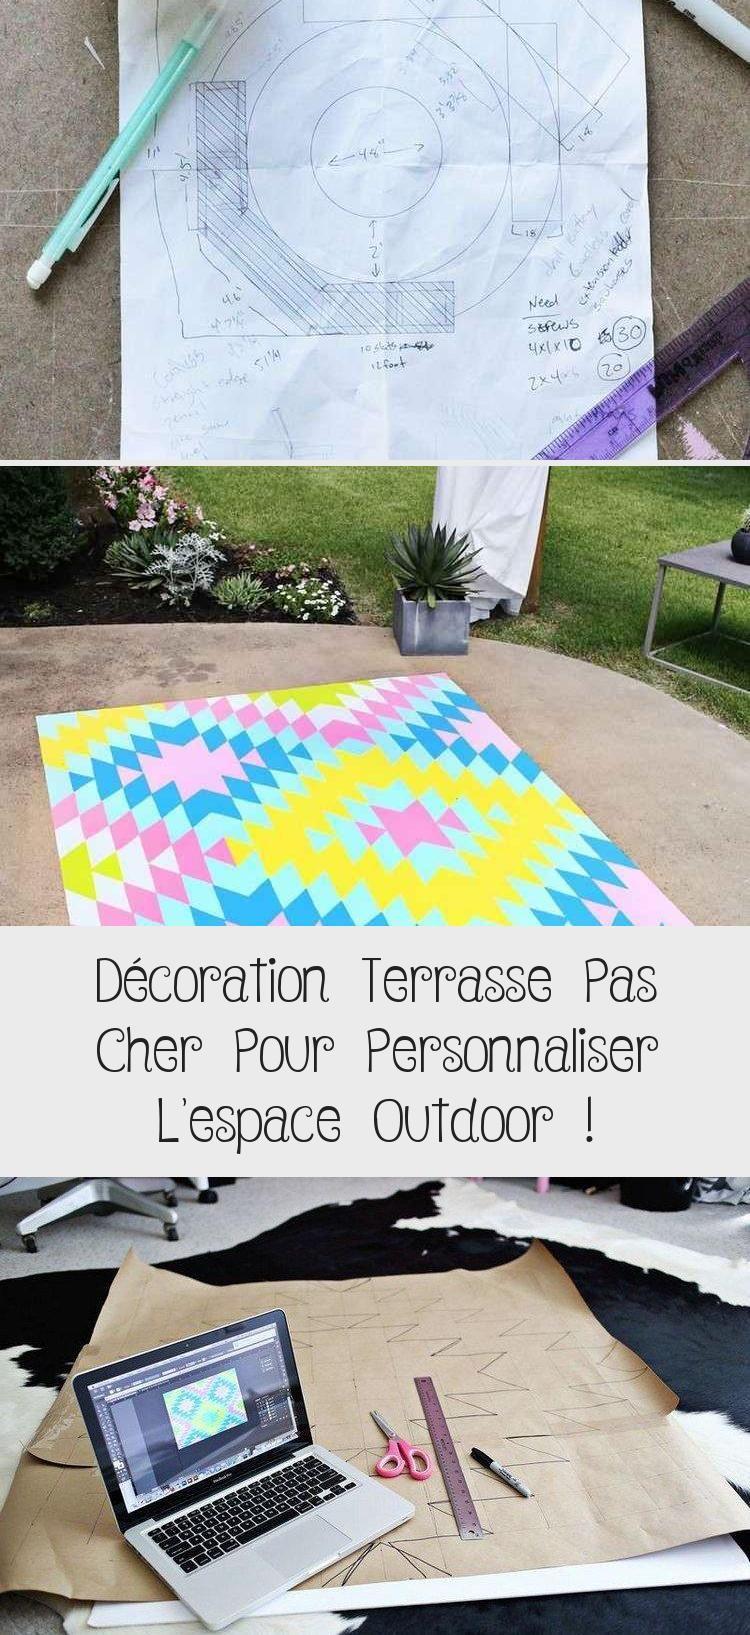 Terrasse Pas Cher Pour Personnaliser L Espace Outdoor Outdoor Blanket Outdoor Beach Mat